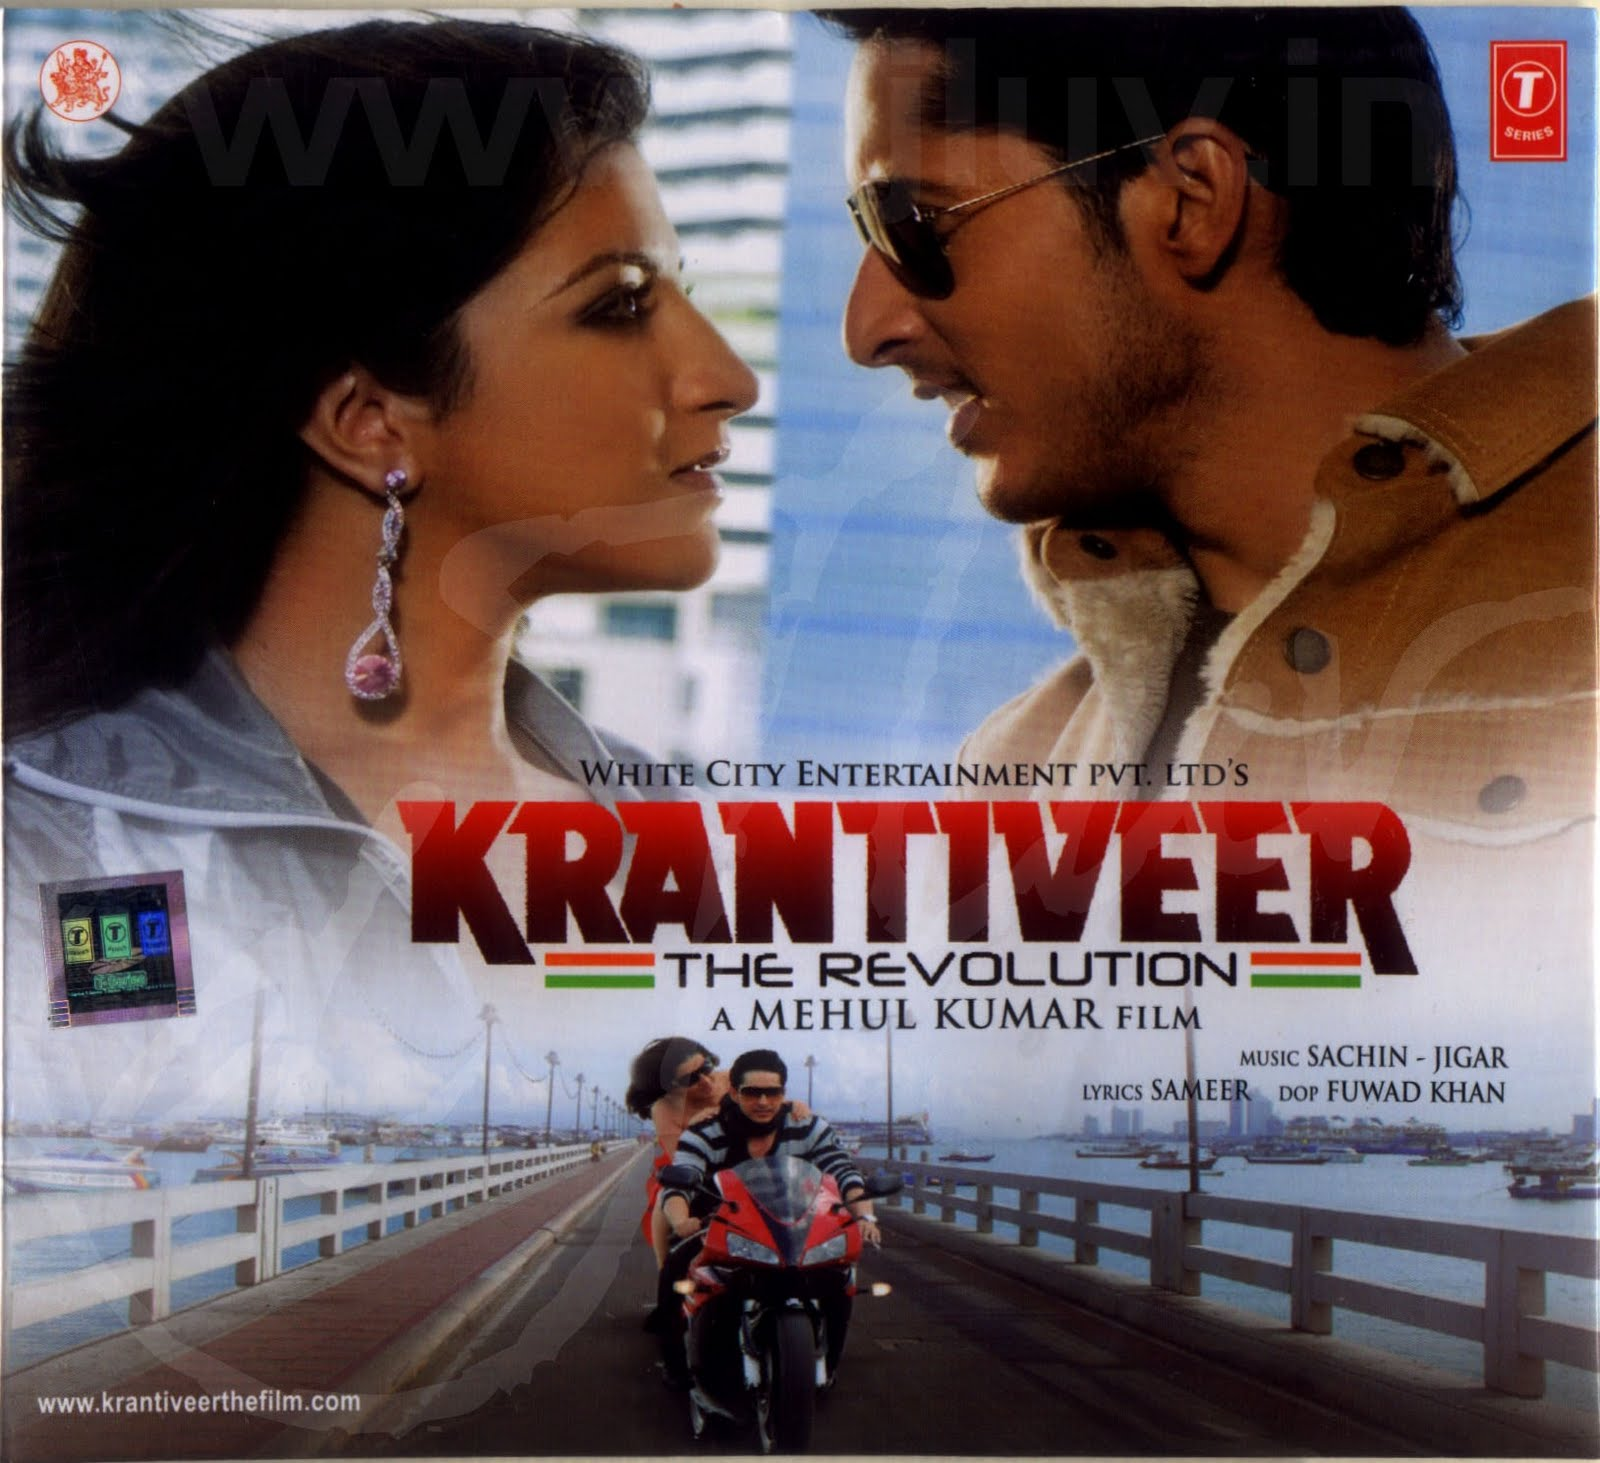 Oo Oh Jaane Jaanaa New Version Mp3 Song: Music World: Krantiveer (2010) Hindi Movie Song Mp3 Free